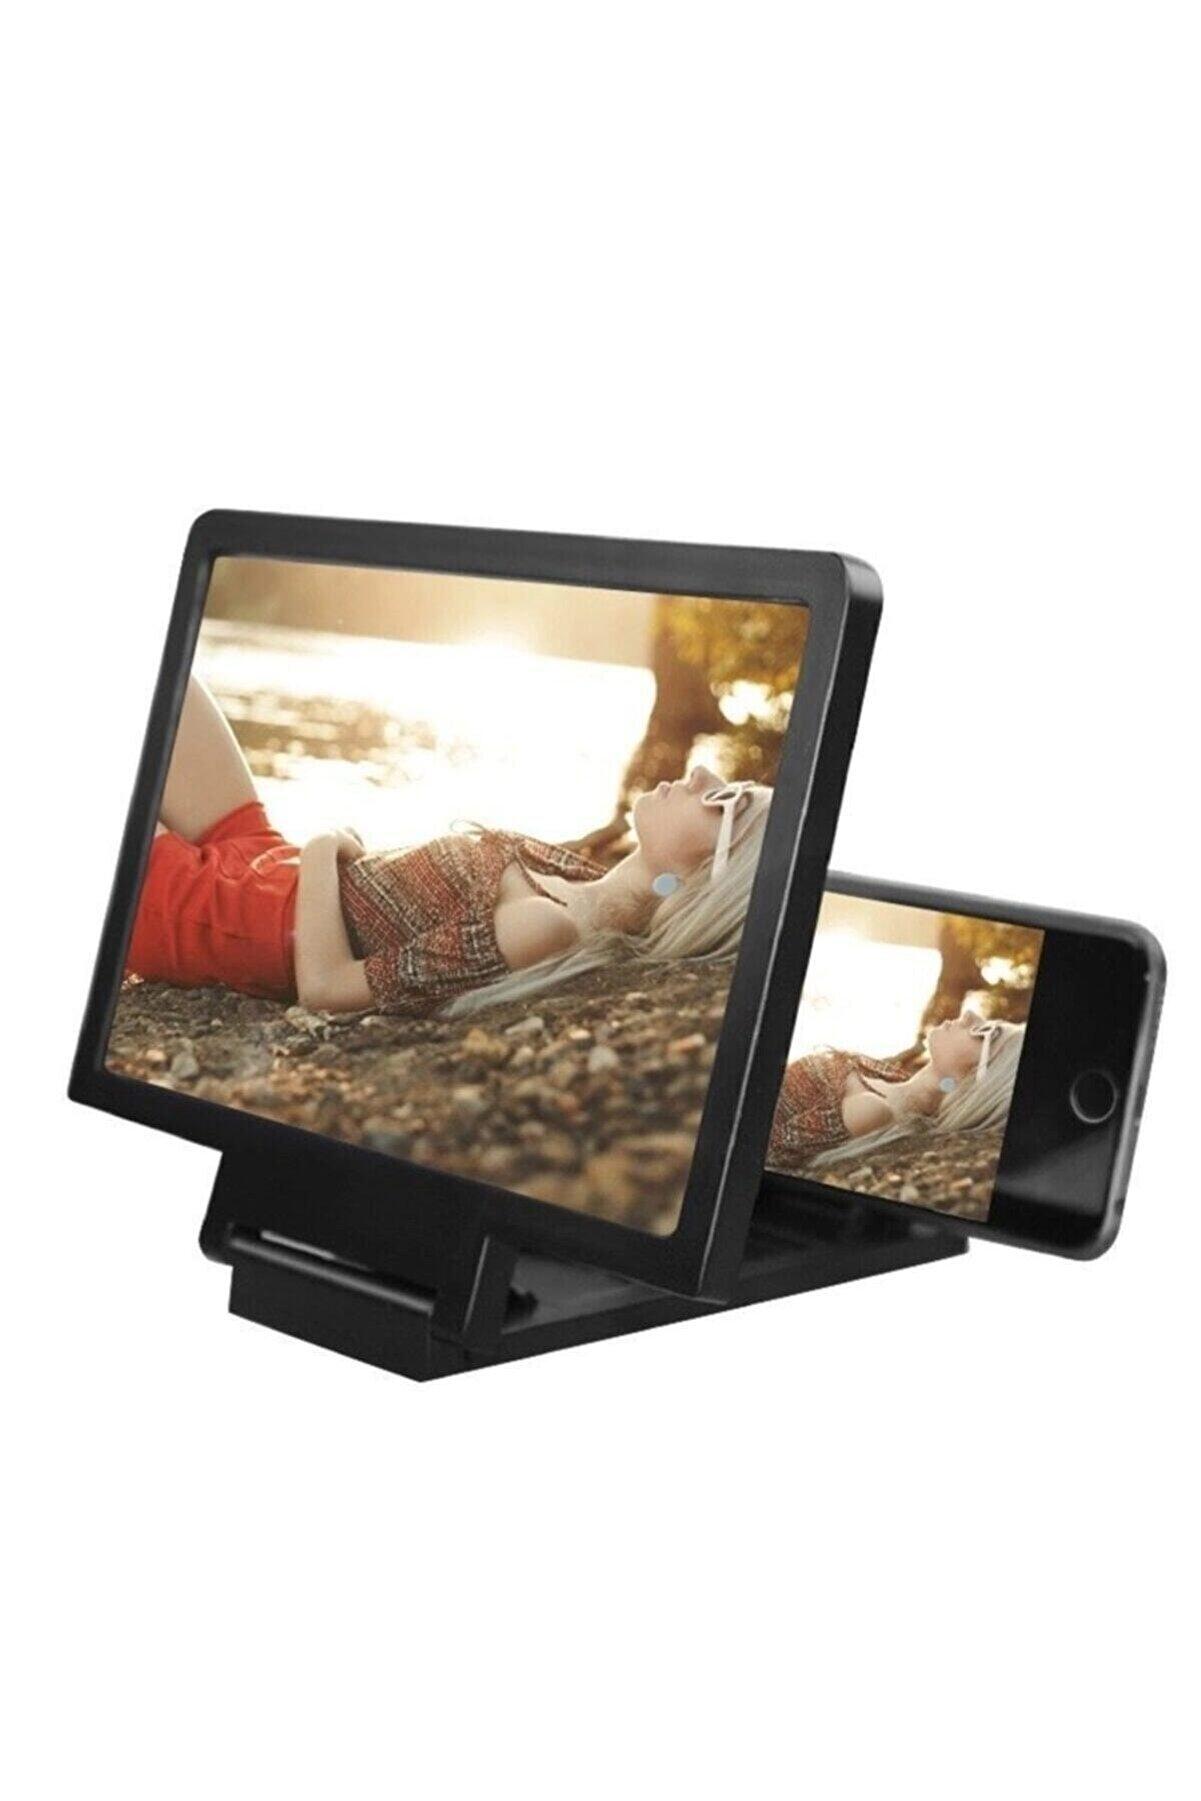 KEYWİN Mi7a Telefon Ekran Büyüteci Görüntü Büyütme Geniş Ekran Video Ekran Büyütücü 3d Büyüteç